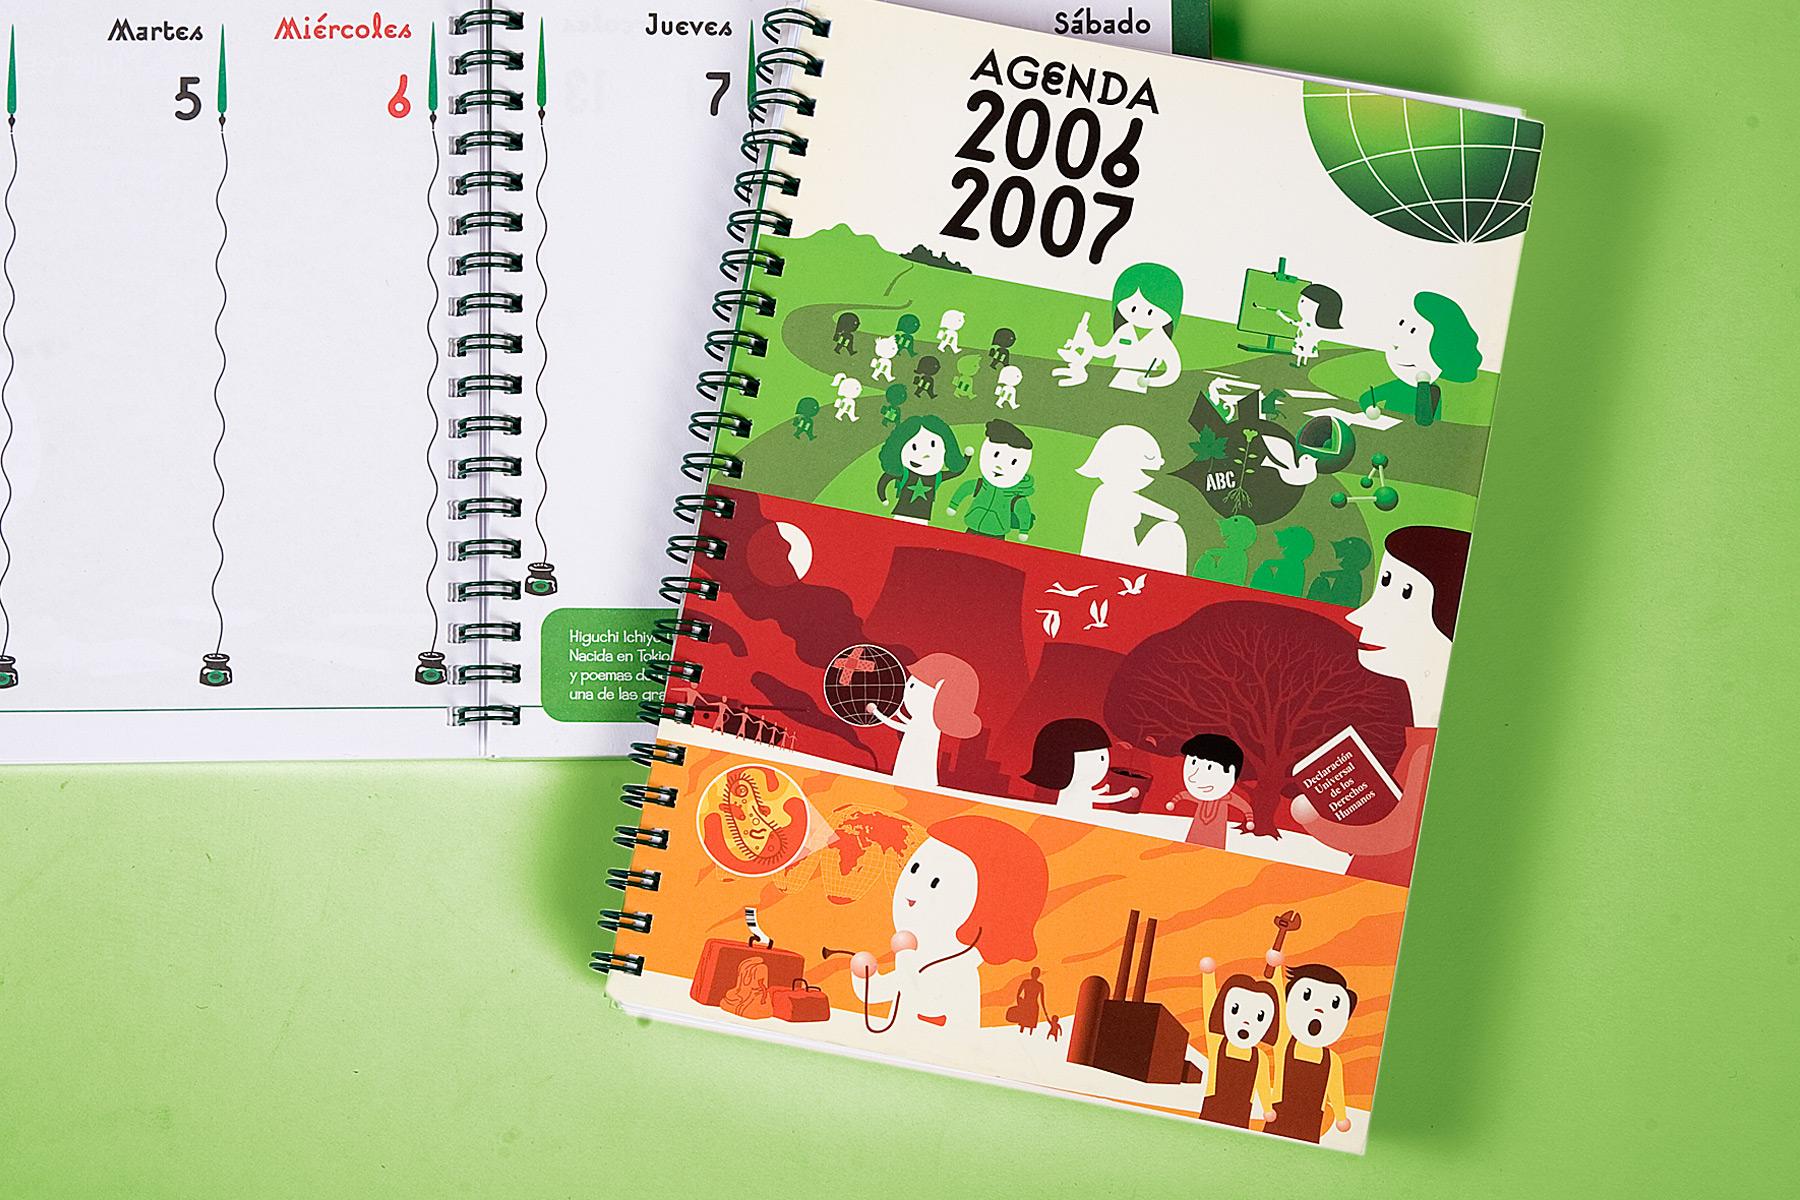 intered-agenda-2006